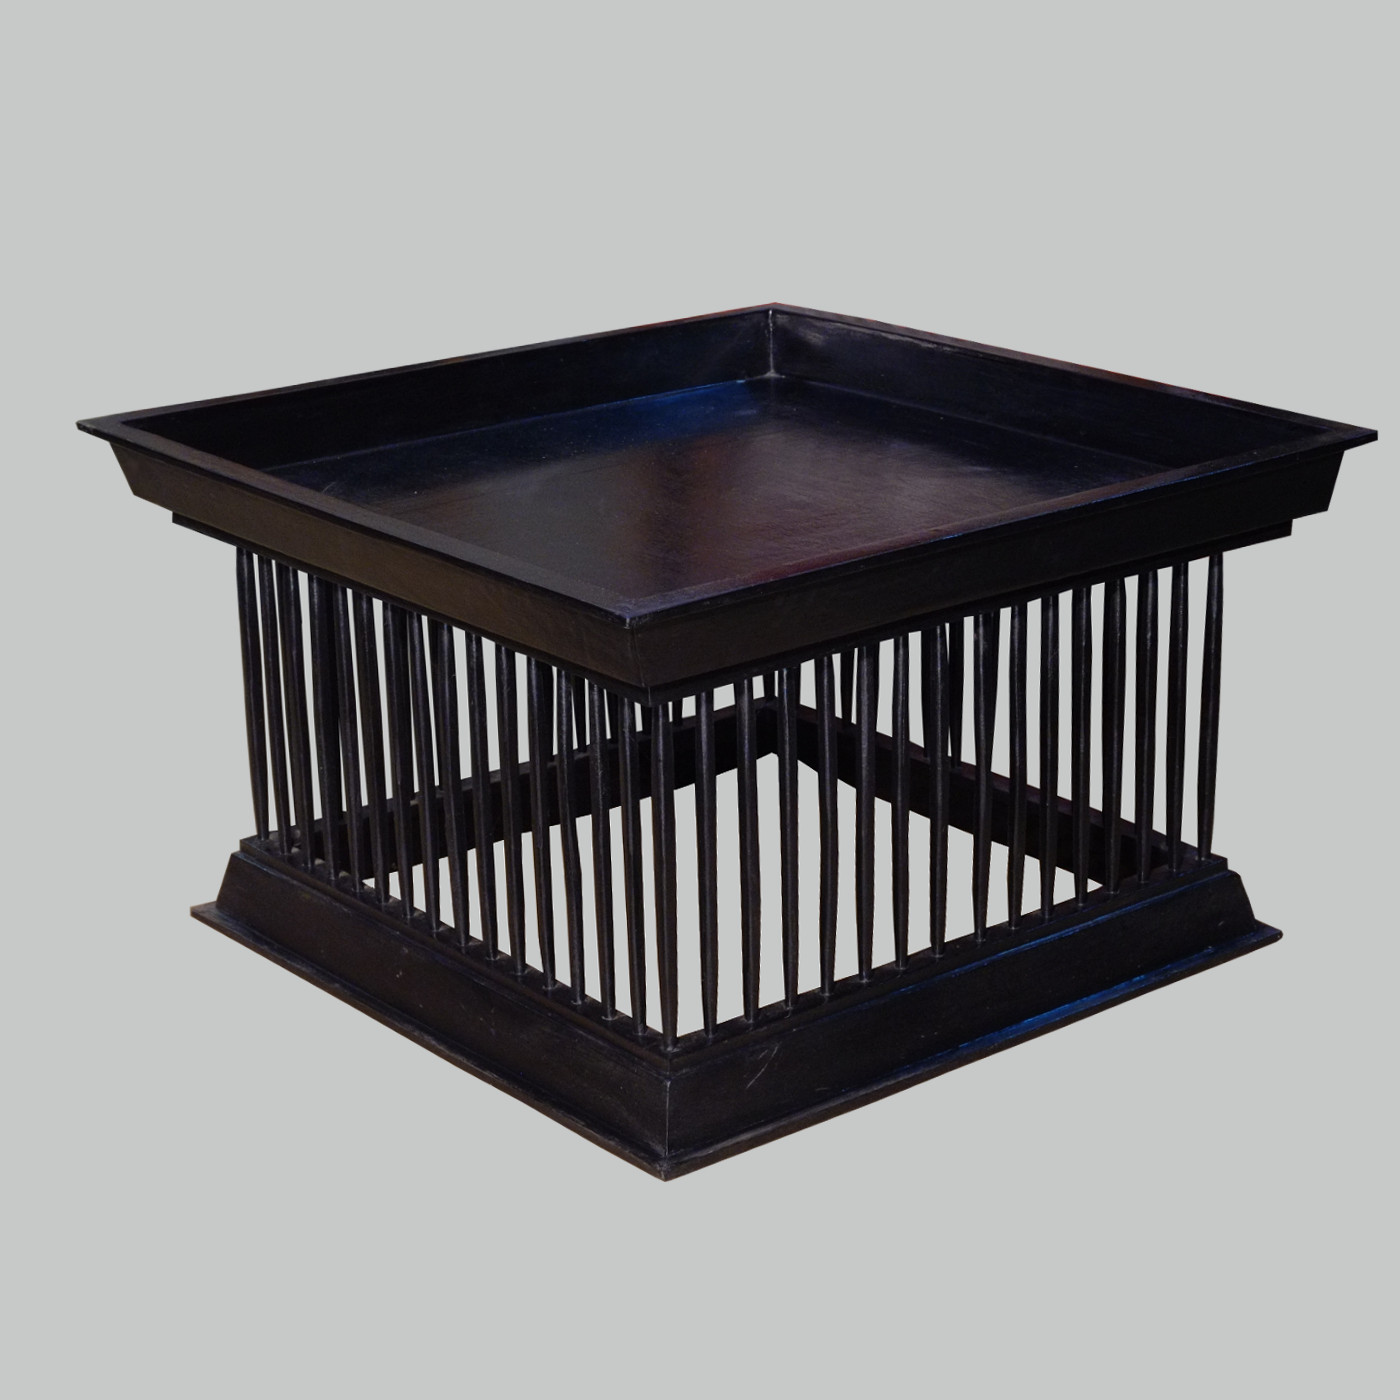 burmesischer tempeltisch schwarz quadratisch 85x85 batavia. Black Bedroom Furniture Sets. Home Design Ideas